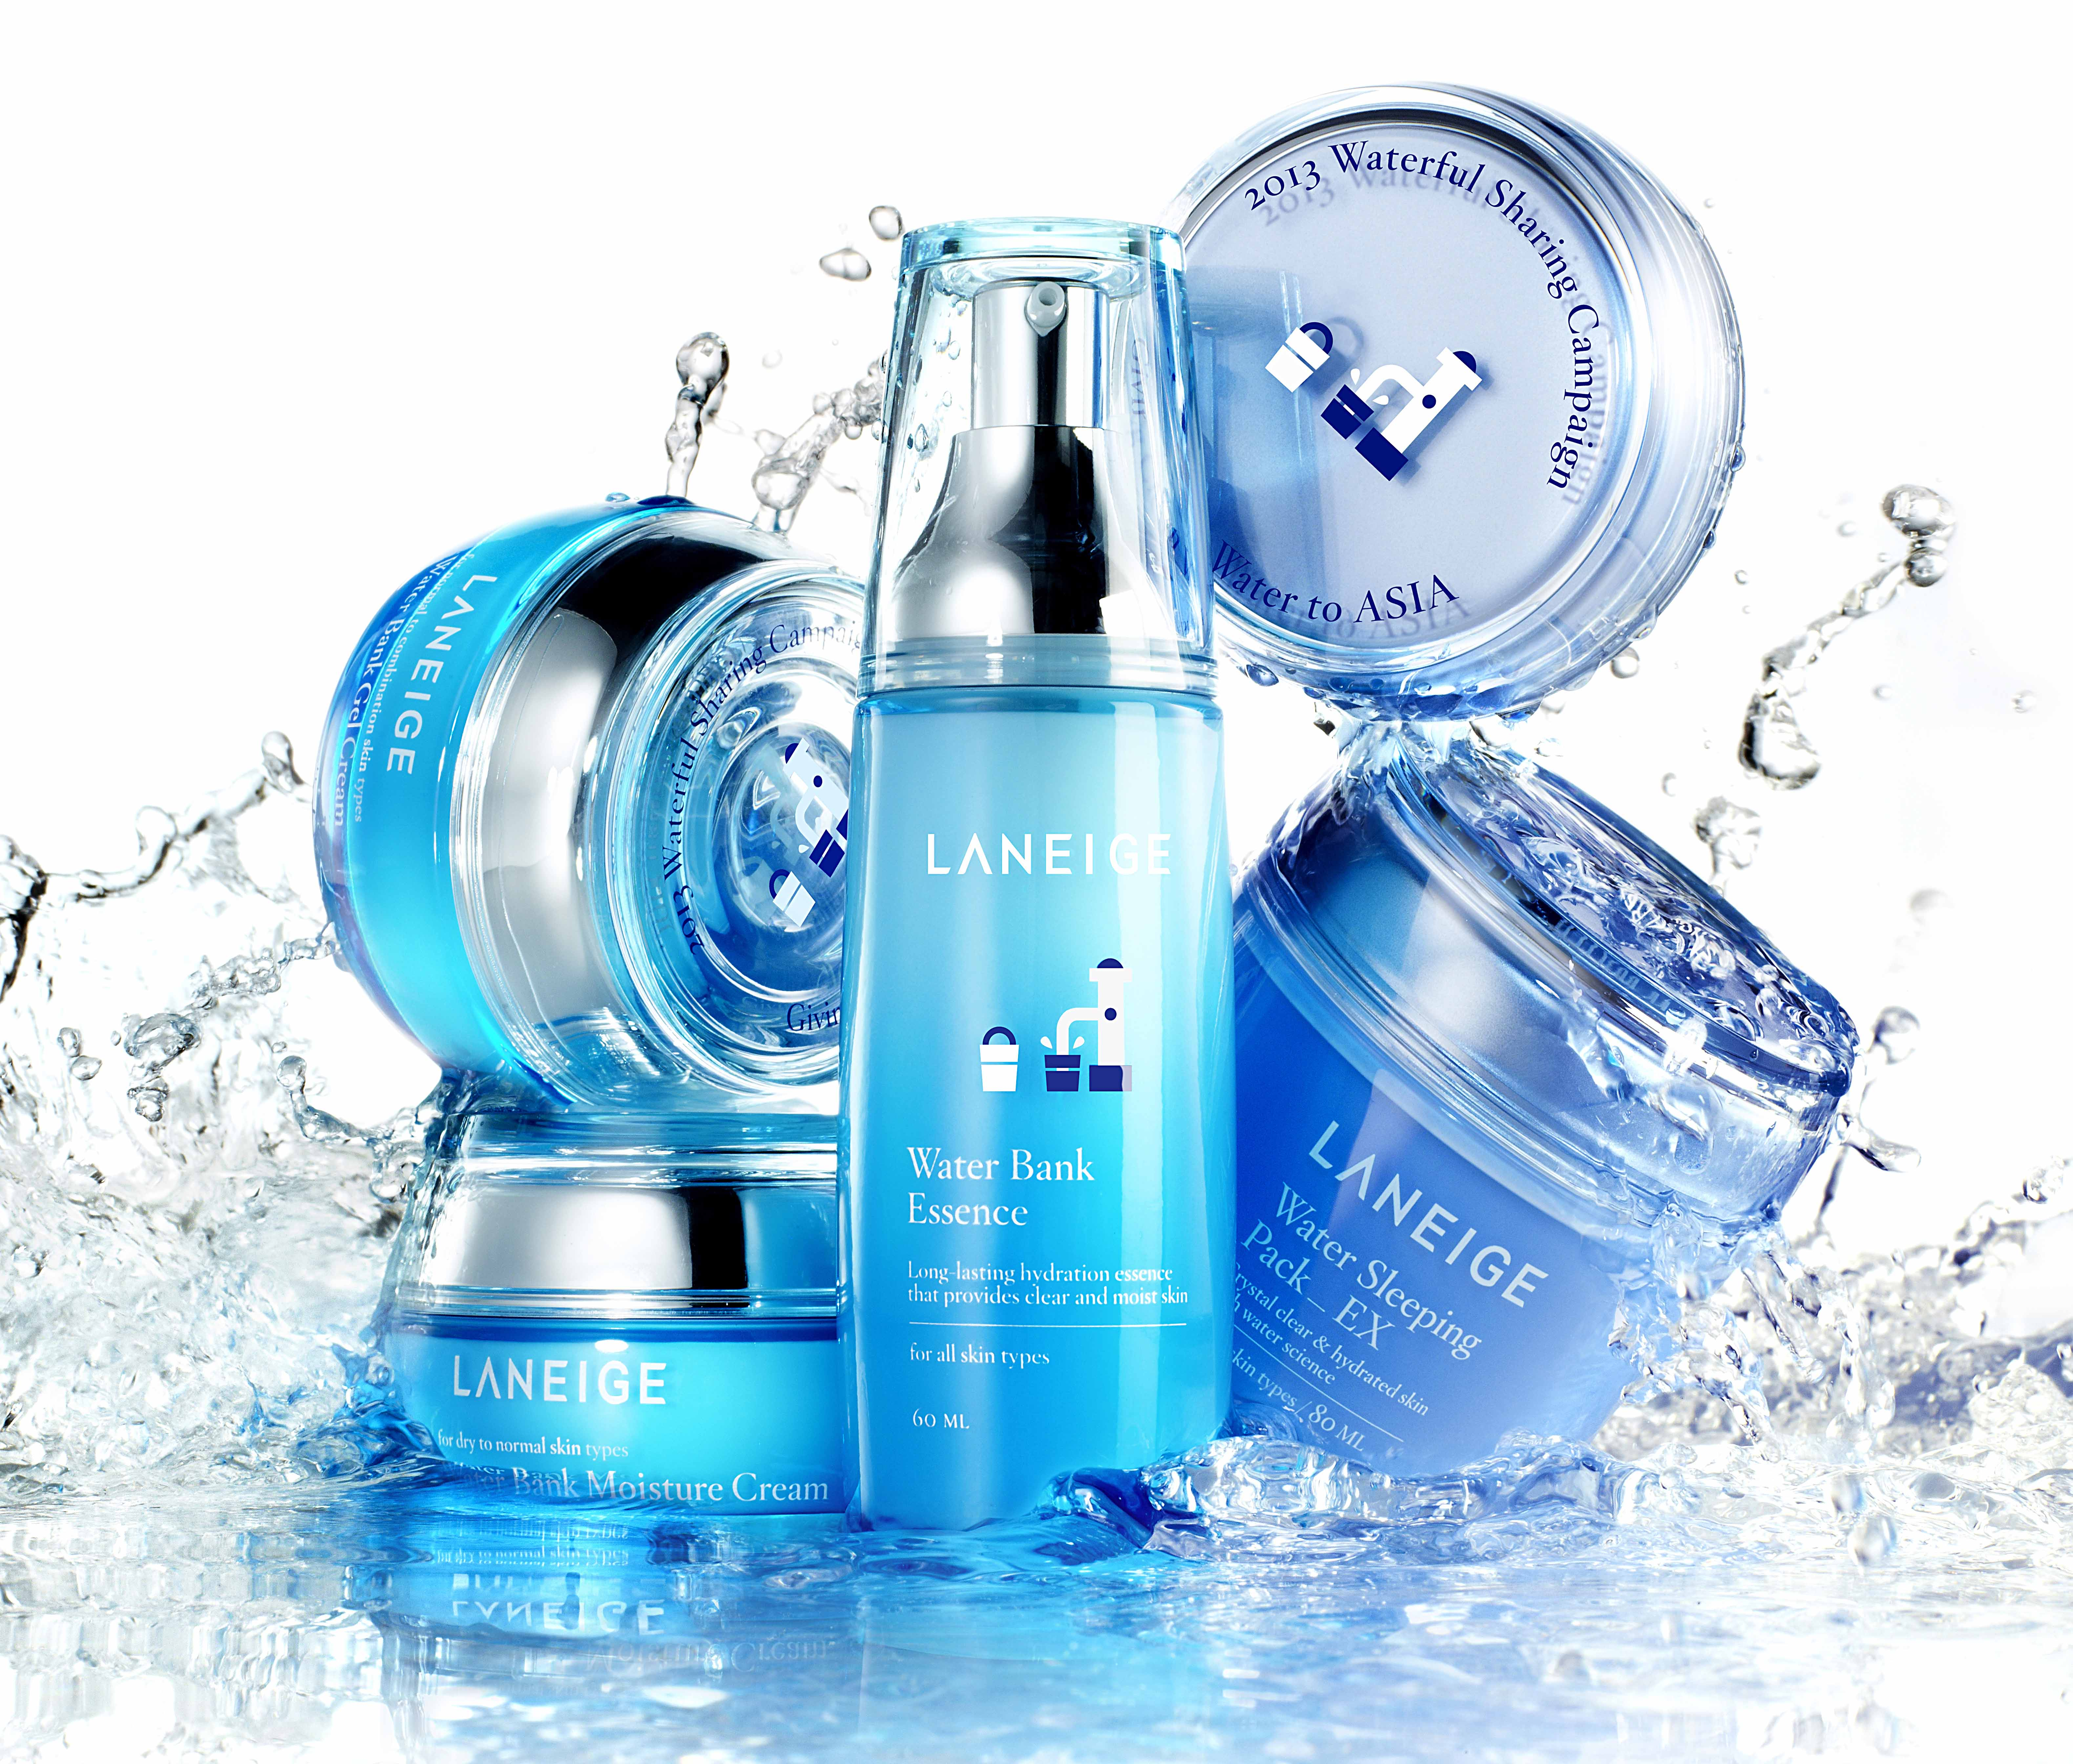 Water Bank Hydrating Gel by Laneige #16